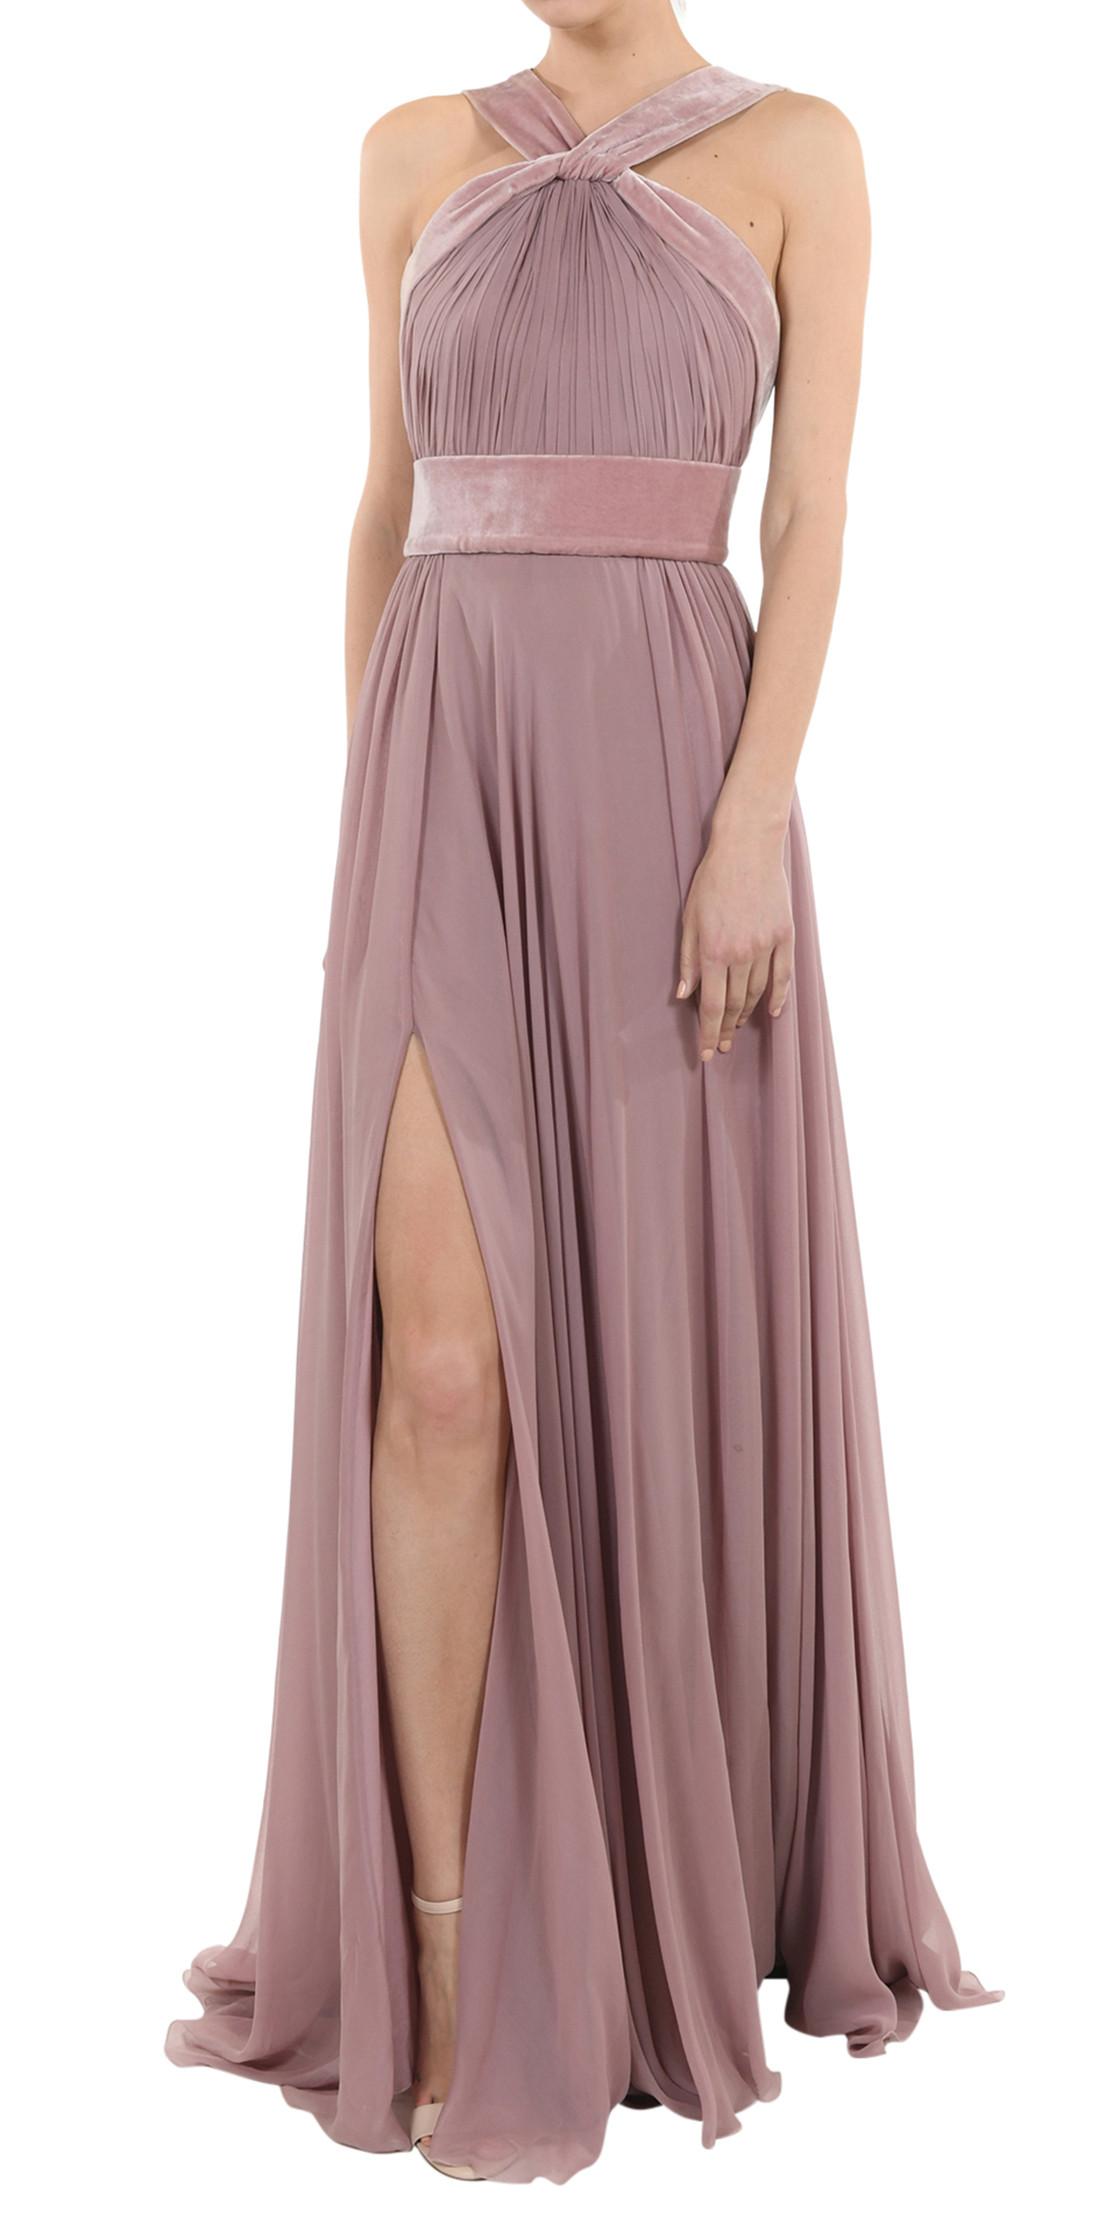 Elie Saab Halter Cady Gown | Evening Dress Rental | Lebanon Rent a ...